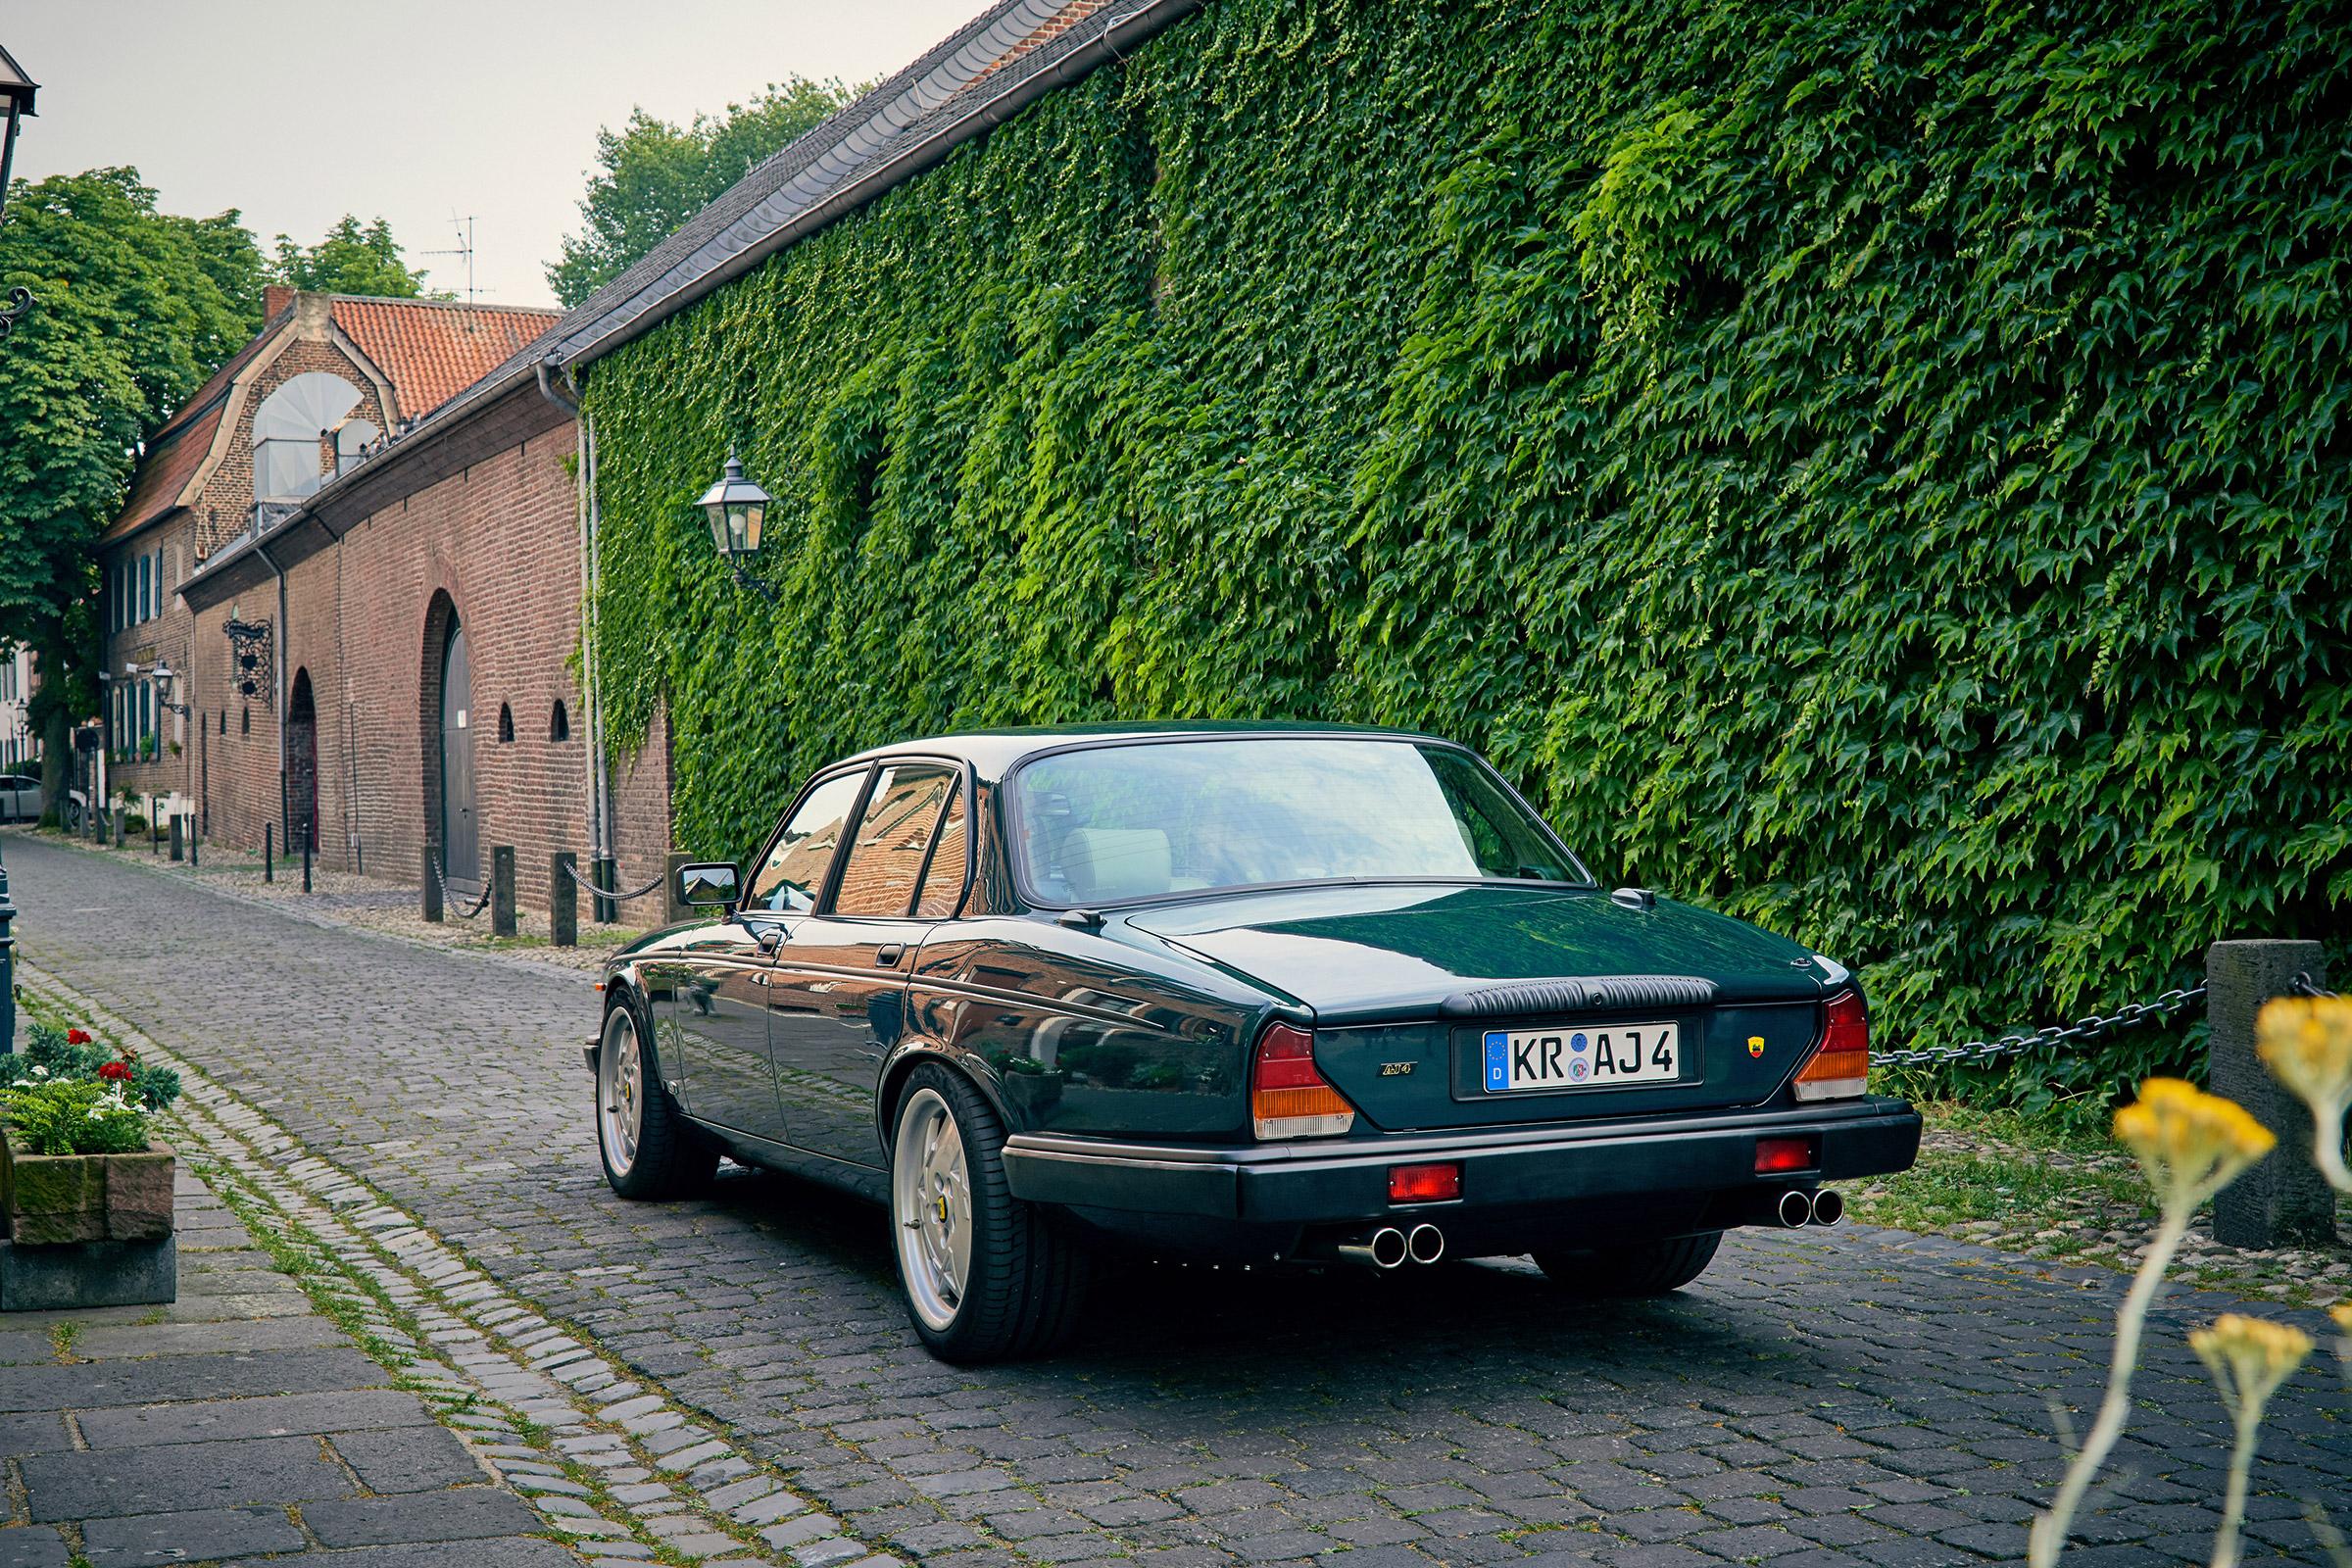 Arden Aj 4 Is A Modern Take On A Tuned Jaguar Xj12 Evo